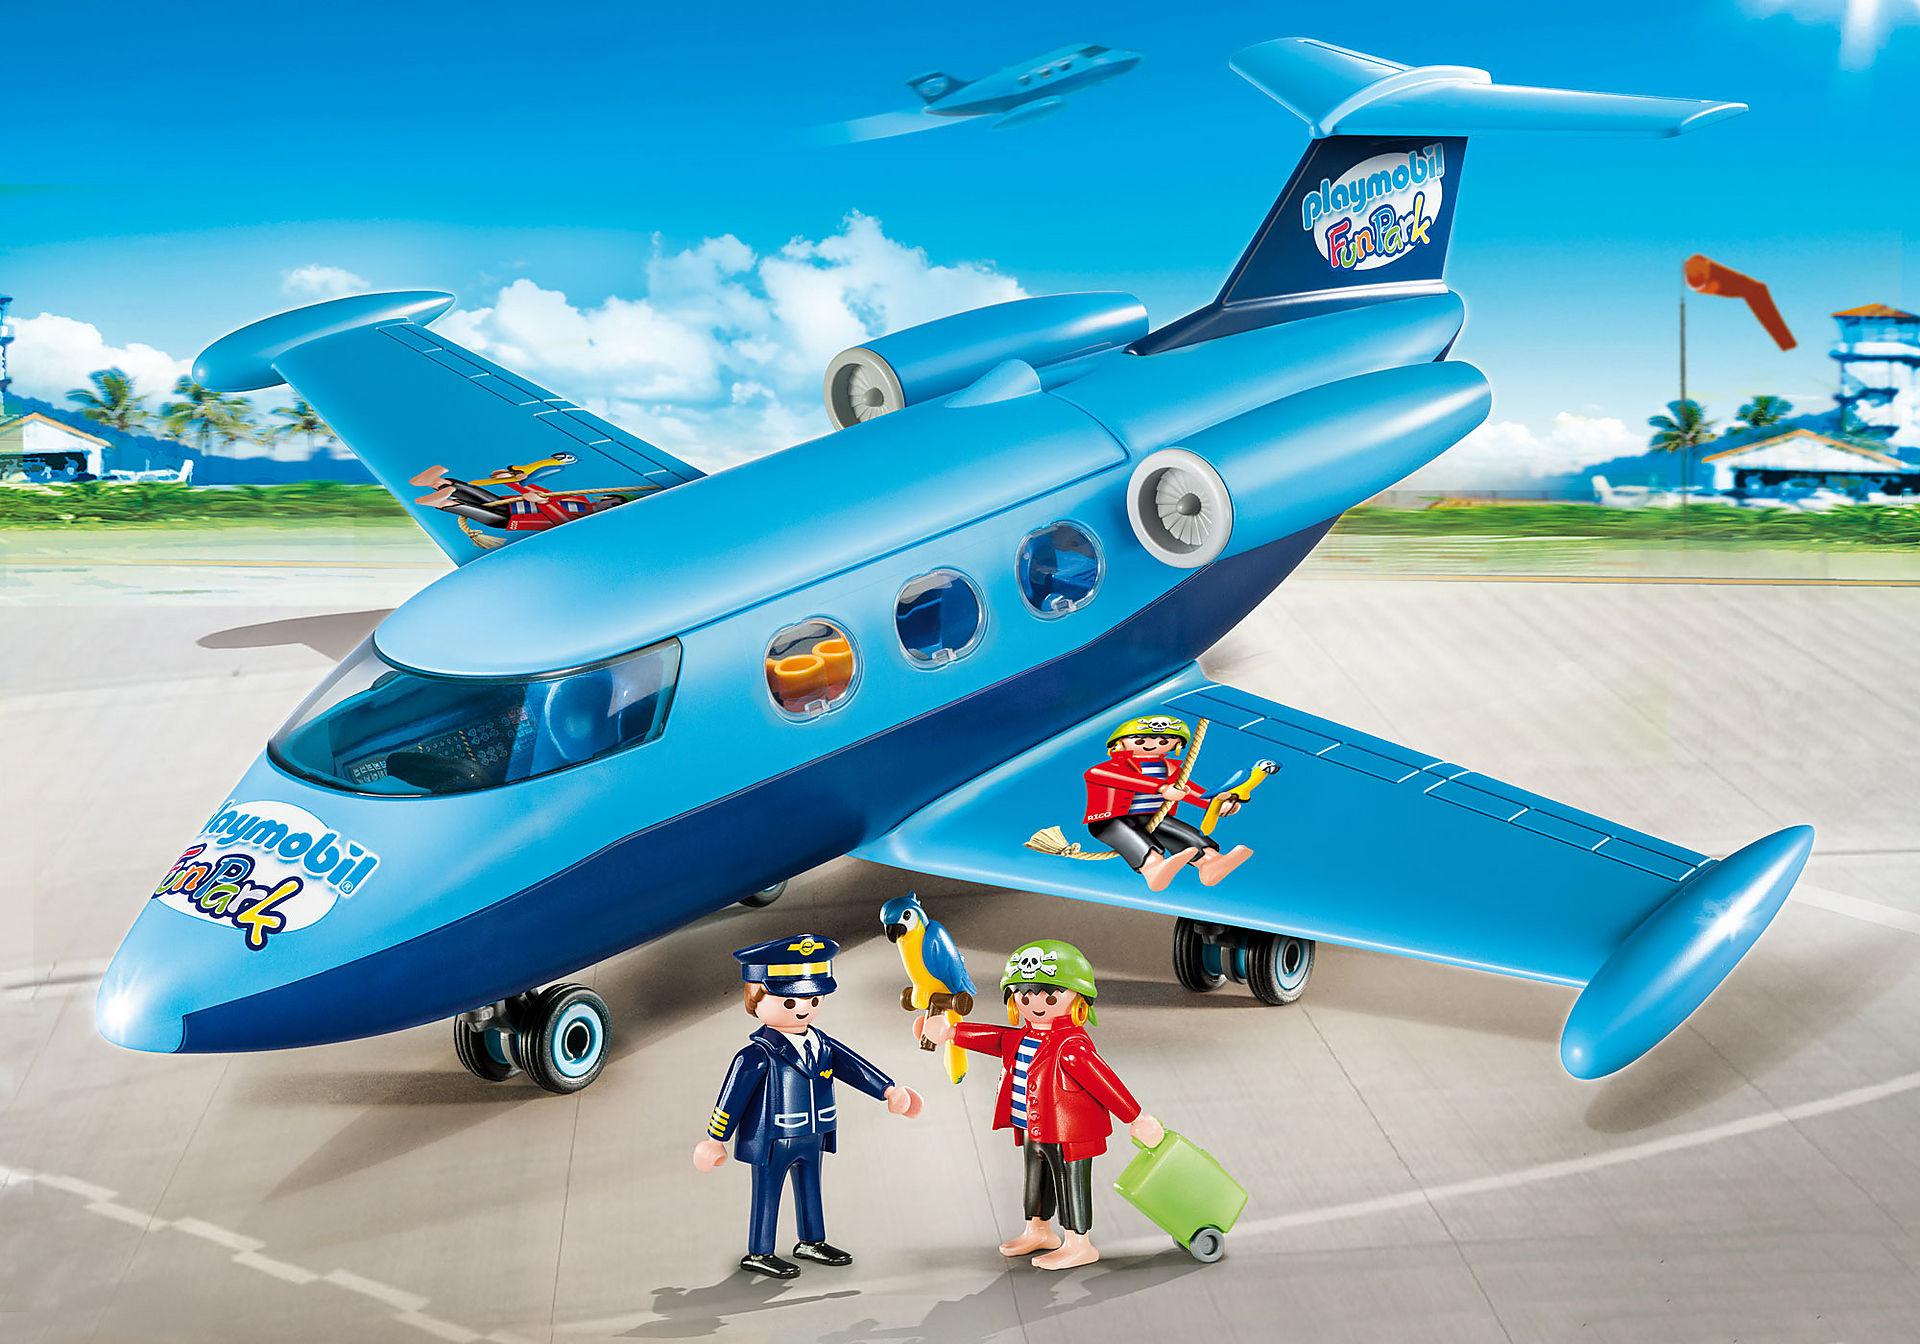 9366 PLAYMOBIL-FunPark Semesterflygplan  zoom image1